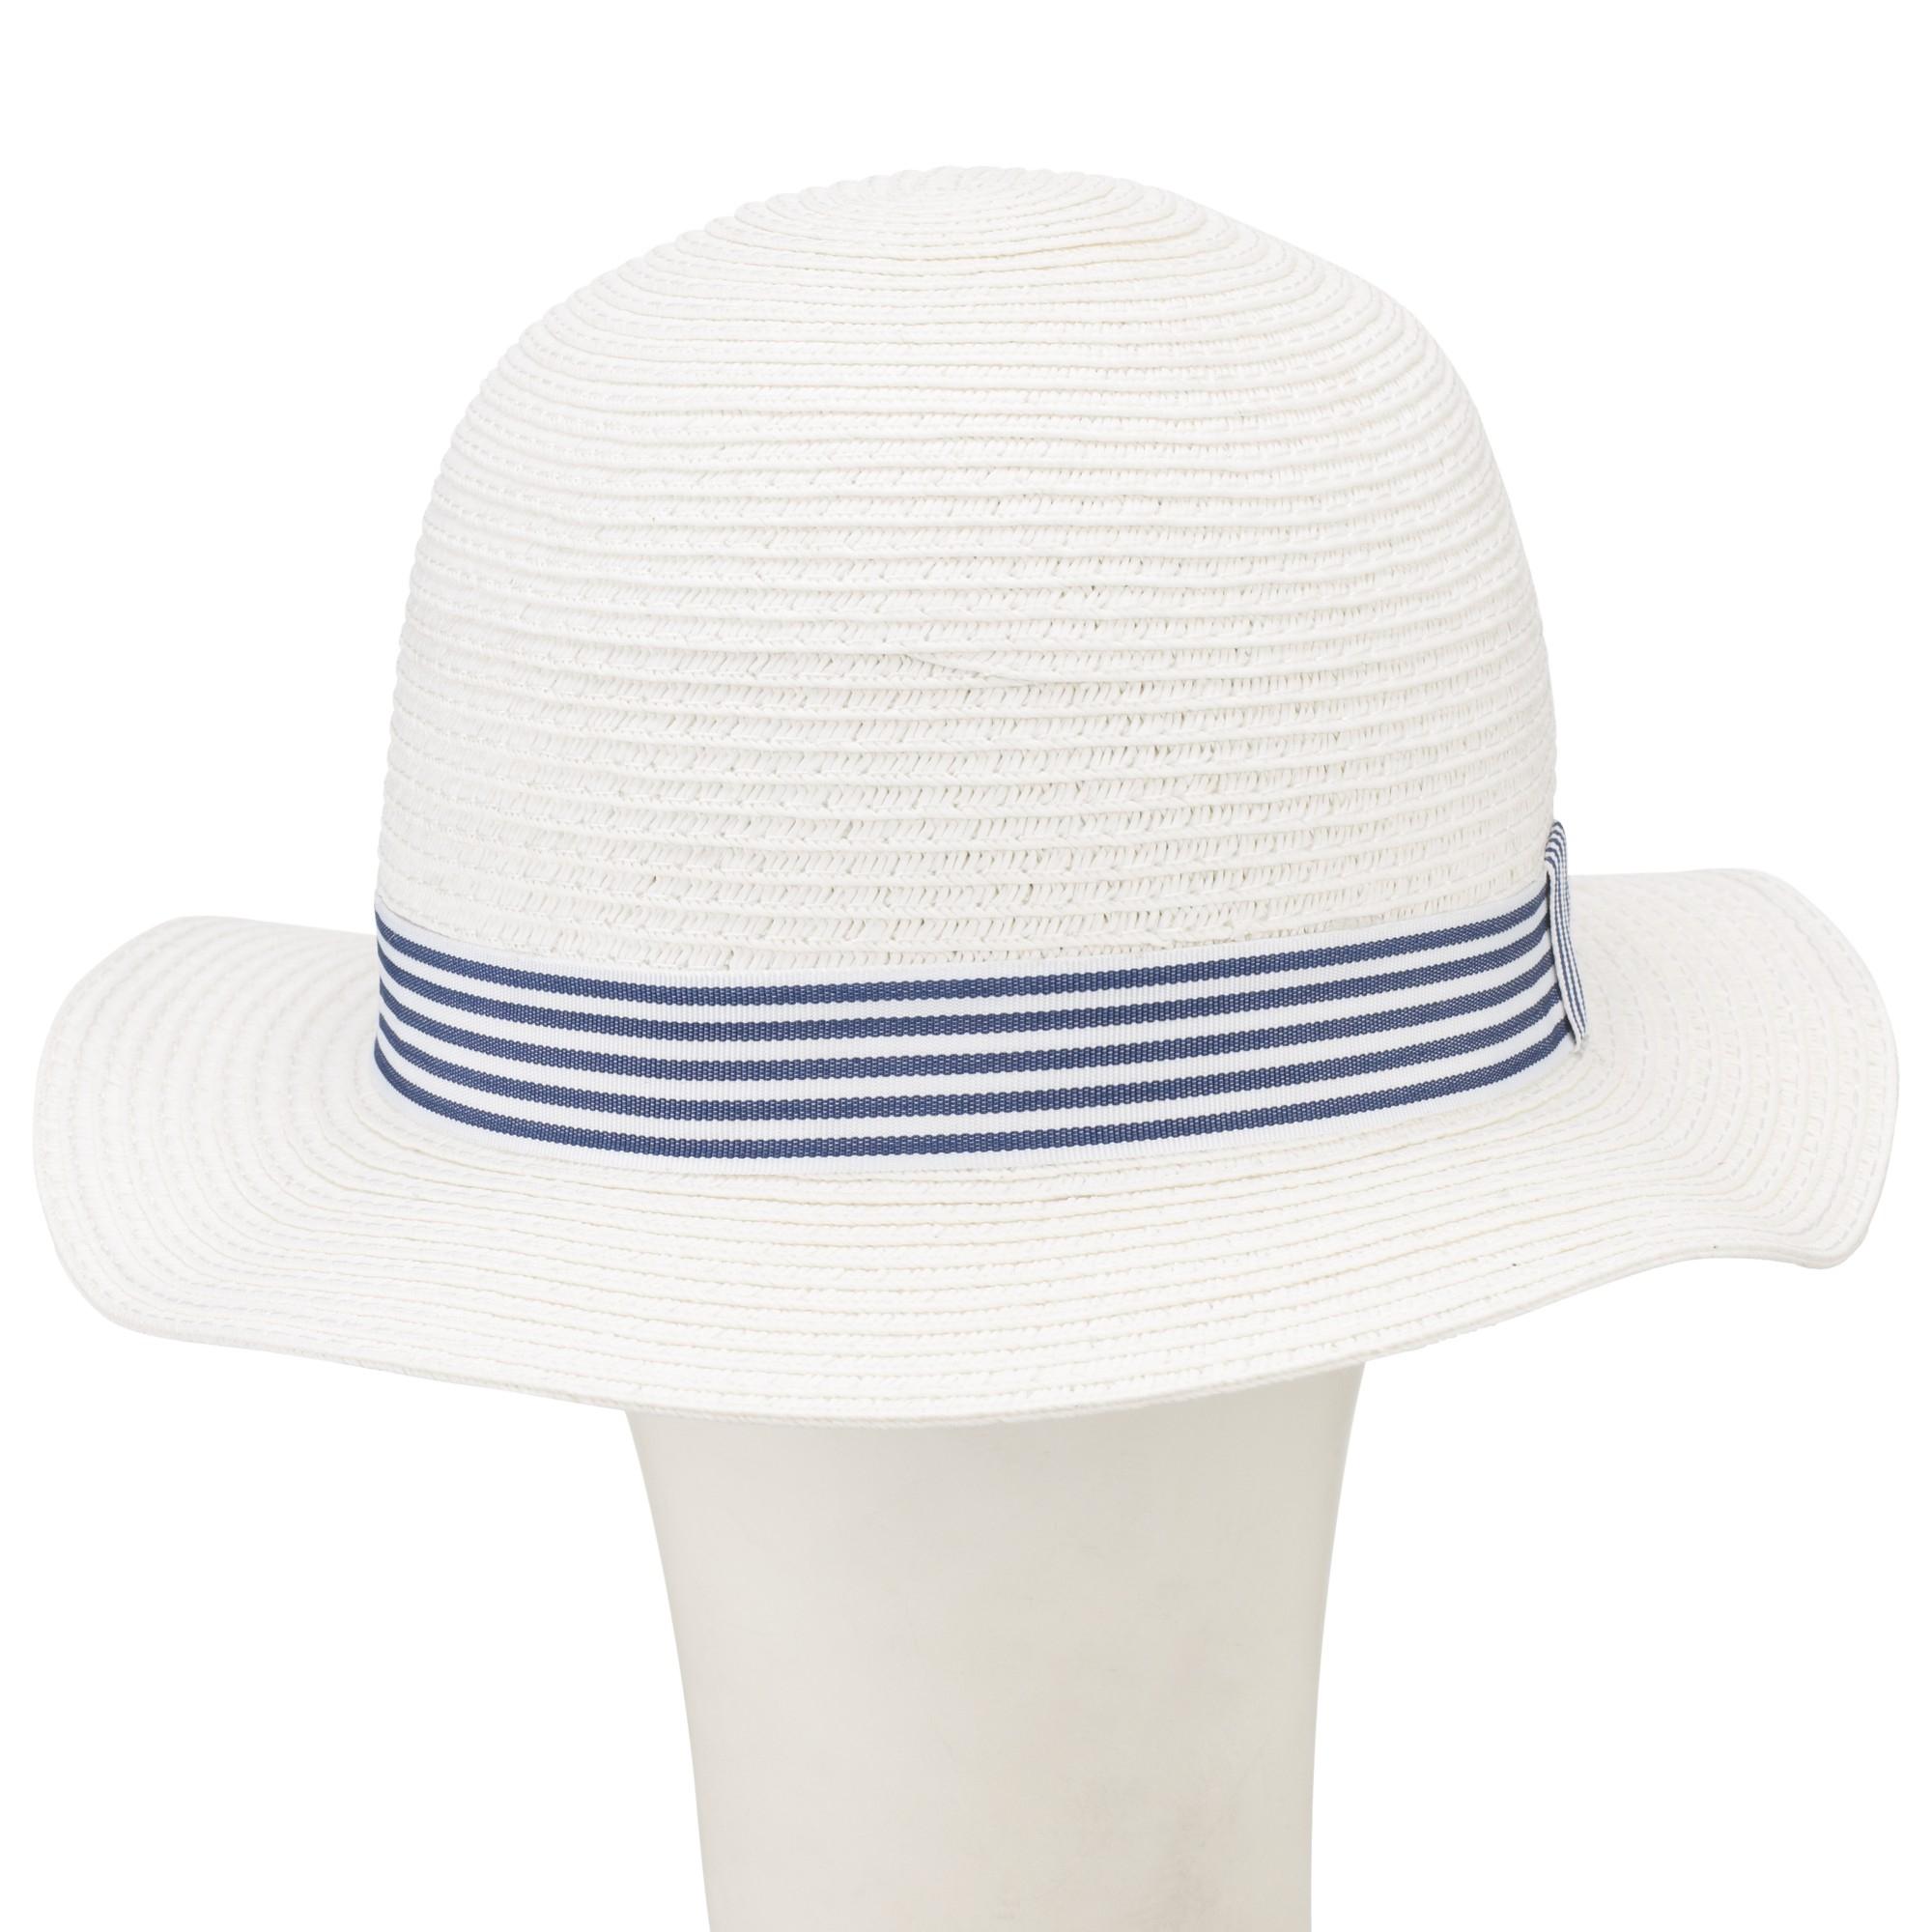 37bc3945583c4 John Lewis Small Brim Summer Hat in White - Lyst